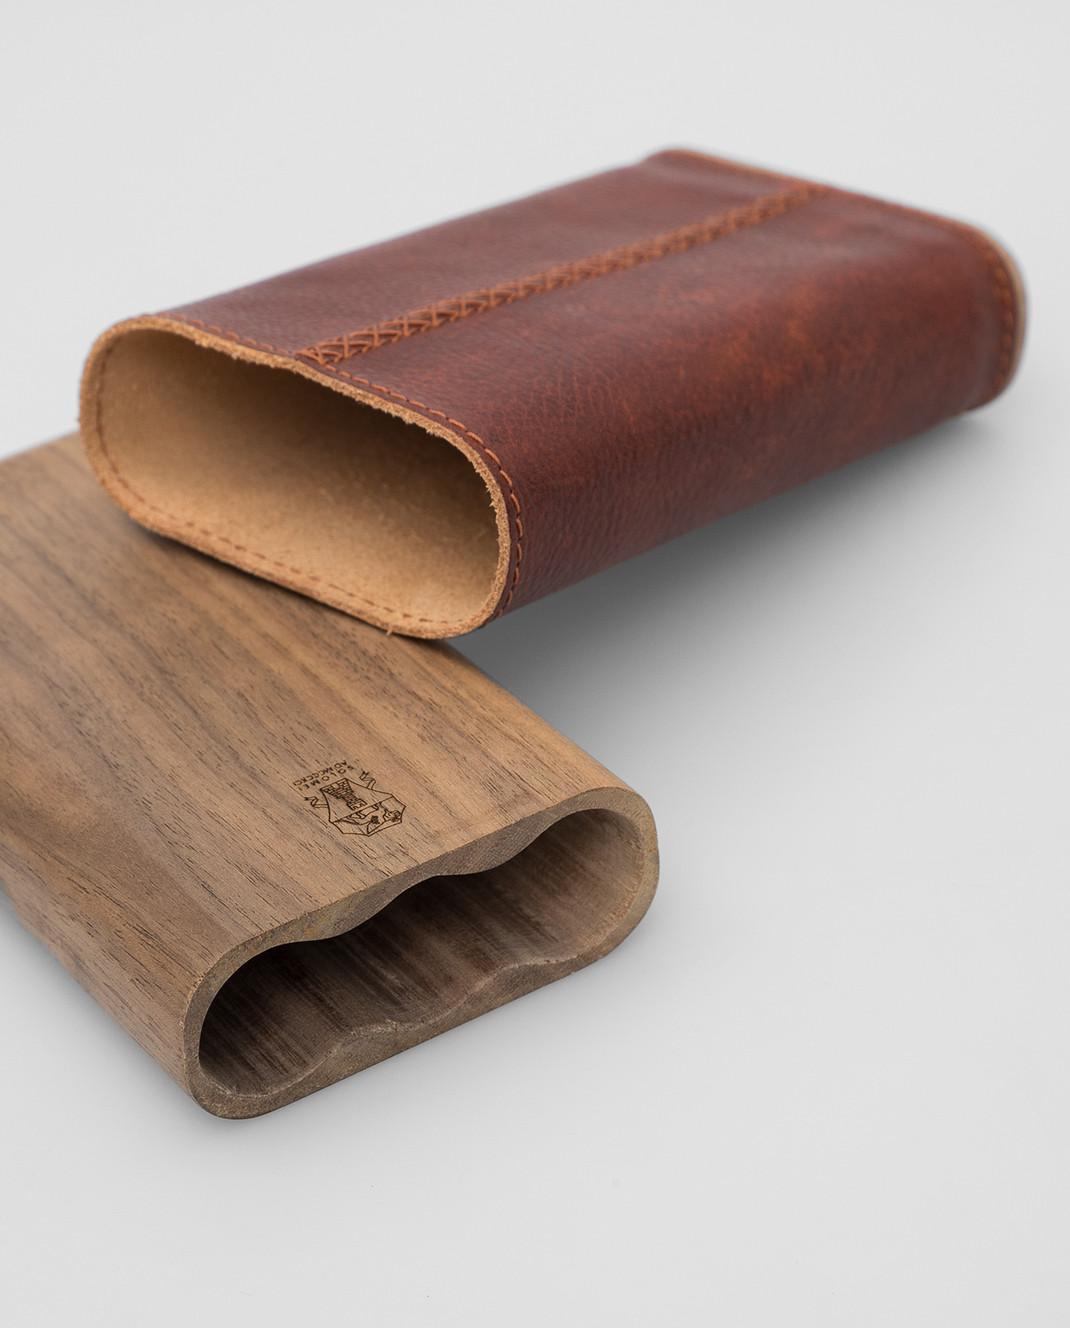 Brunello Cucinelli Тубус для сигар изображение 3